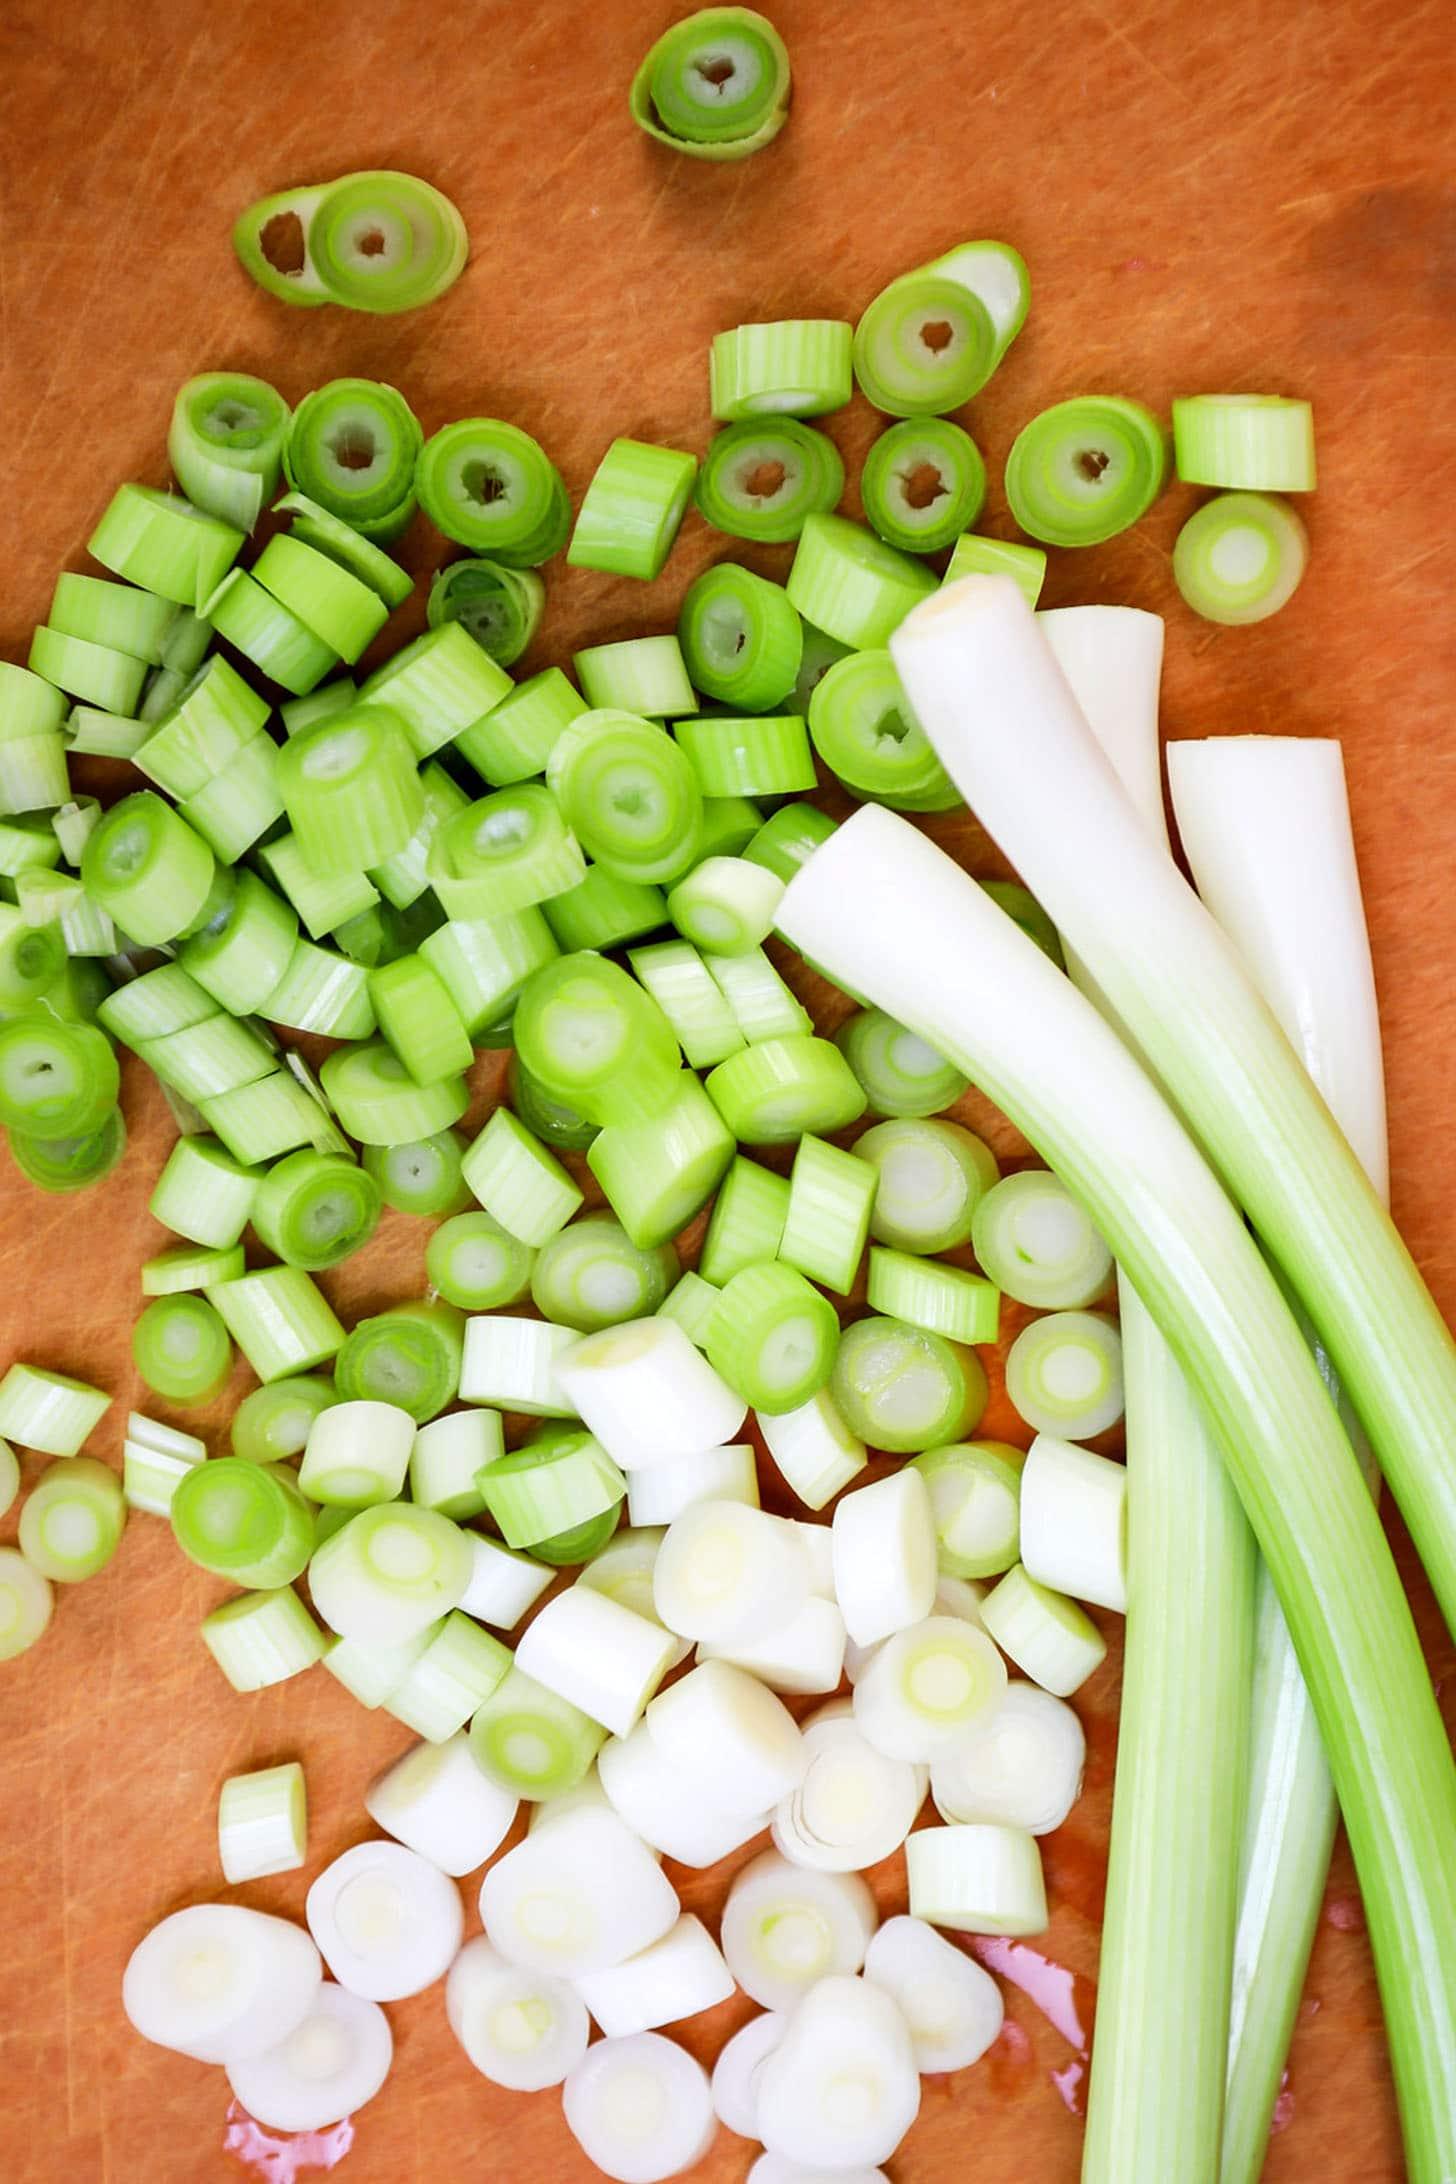 Scallions_vs_Green_Onions_4